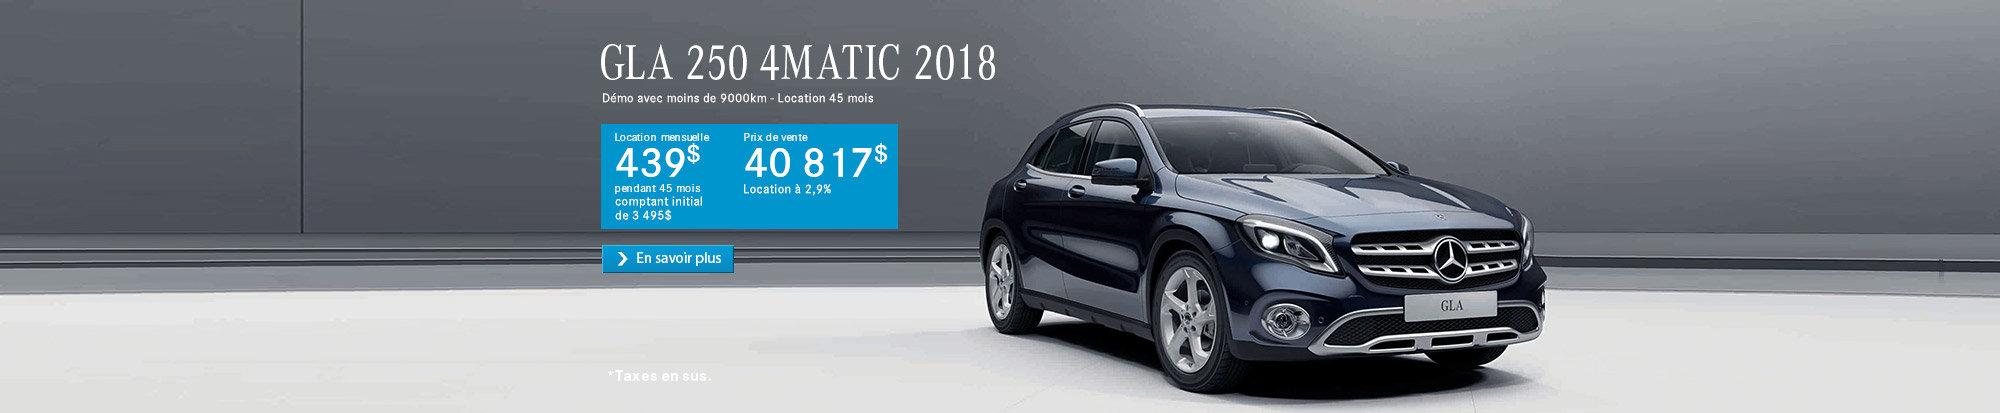 GLA 250 2018 - web